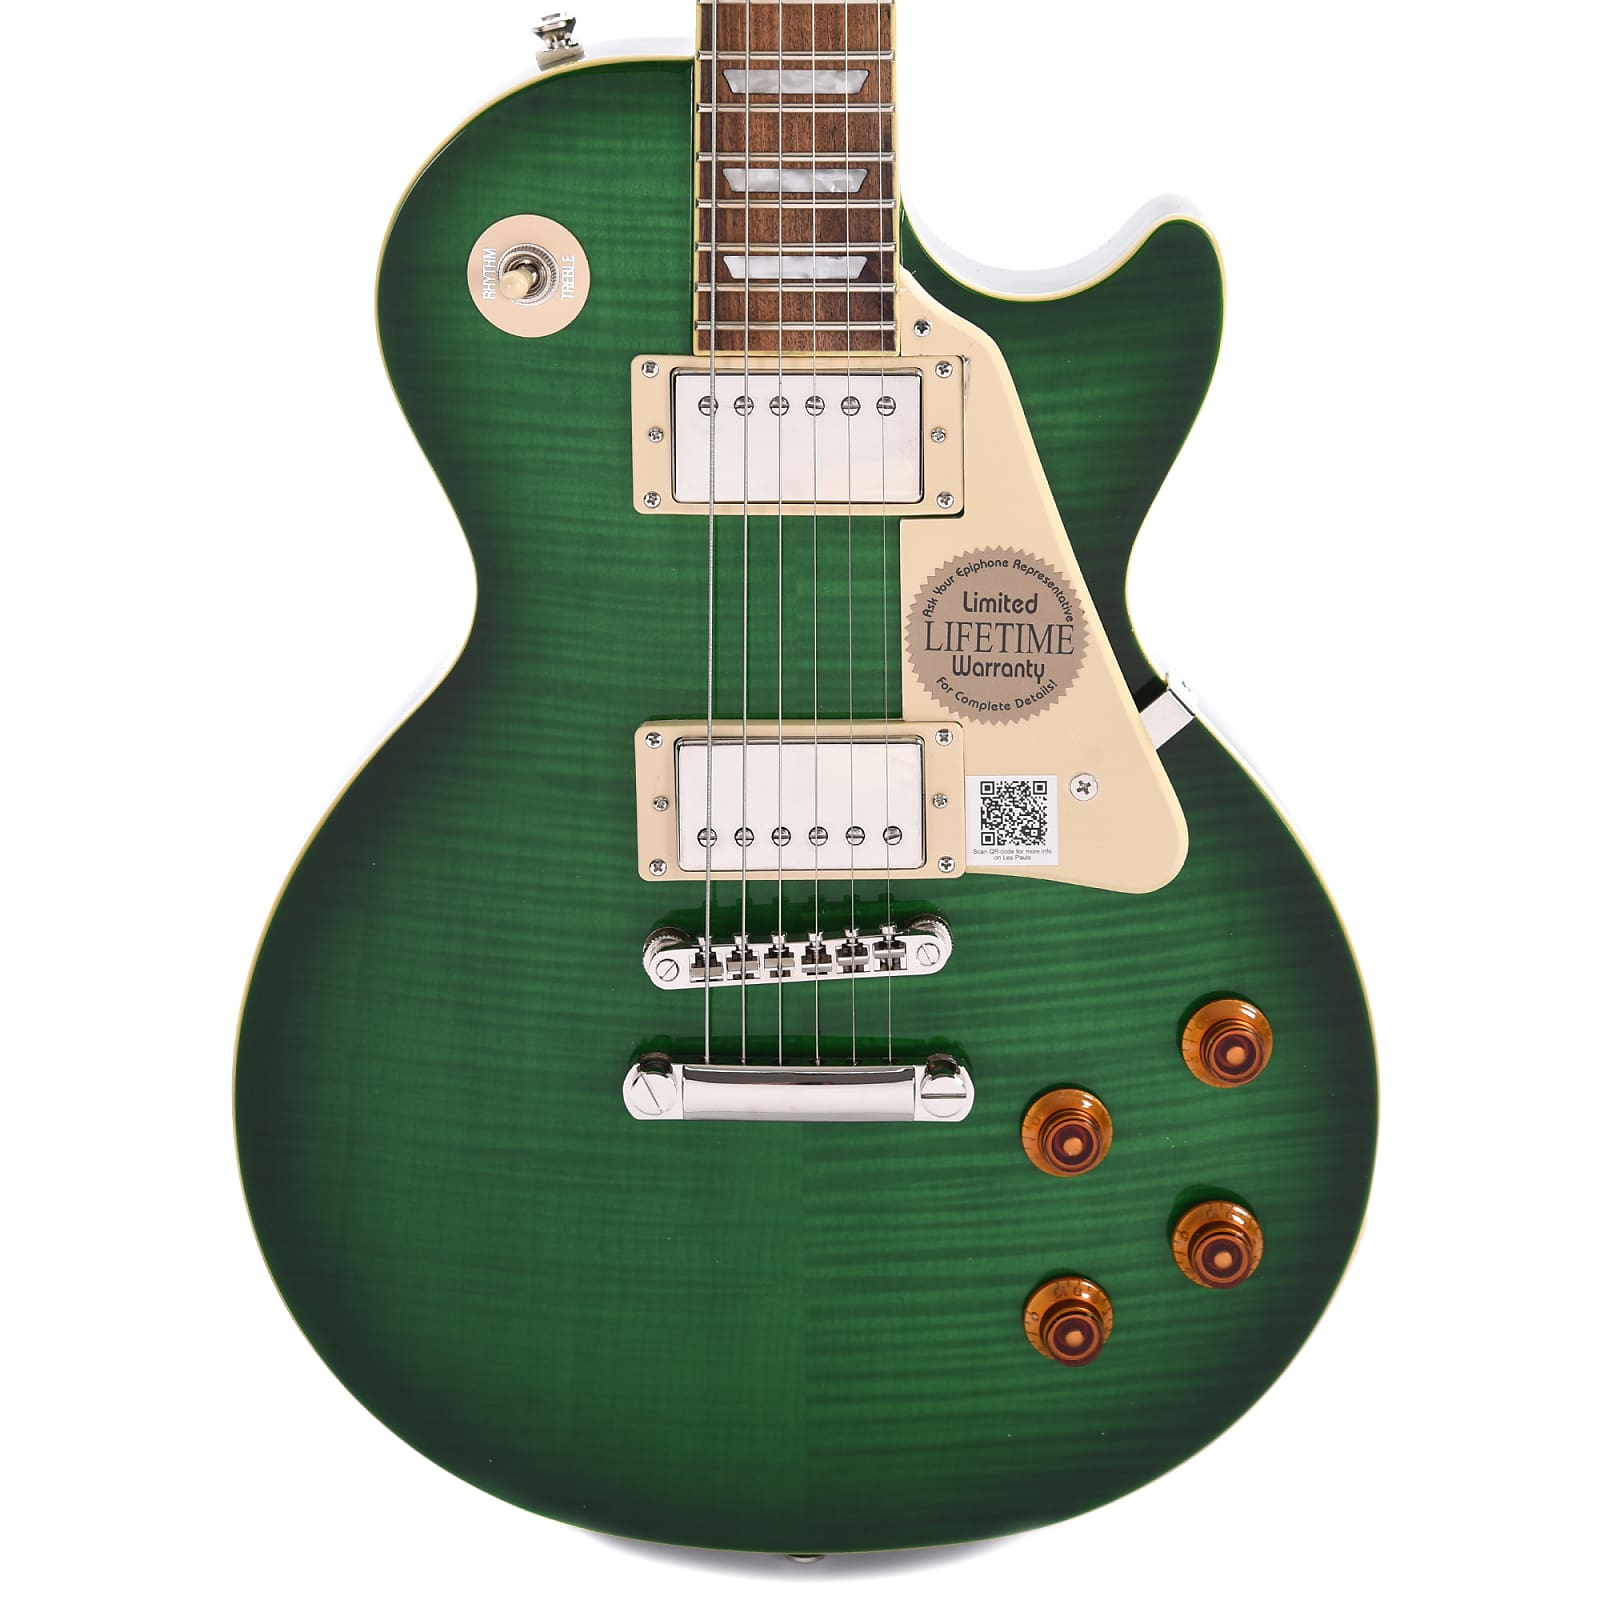 abgeholt gesamte Sammlung Suche nach Beamten Epiphone Les Paul Standard Plus-Top Pro Green Burst w/ProBuckers & Coil-Tap